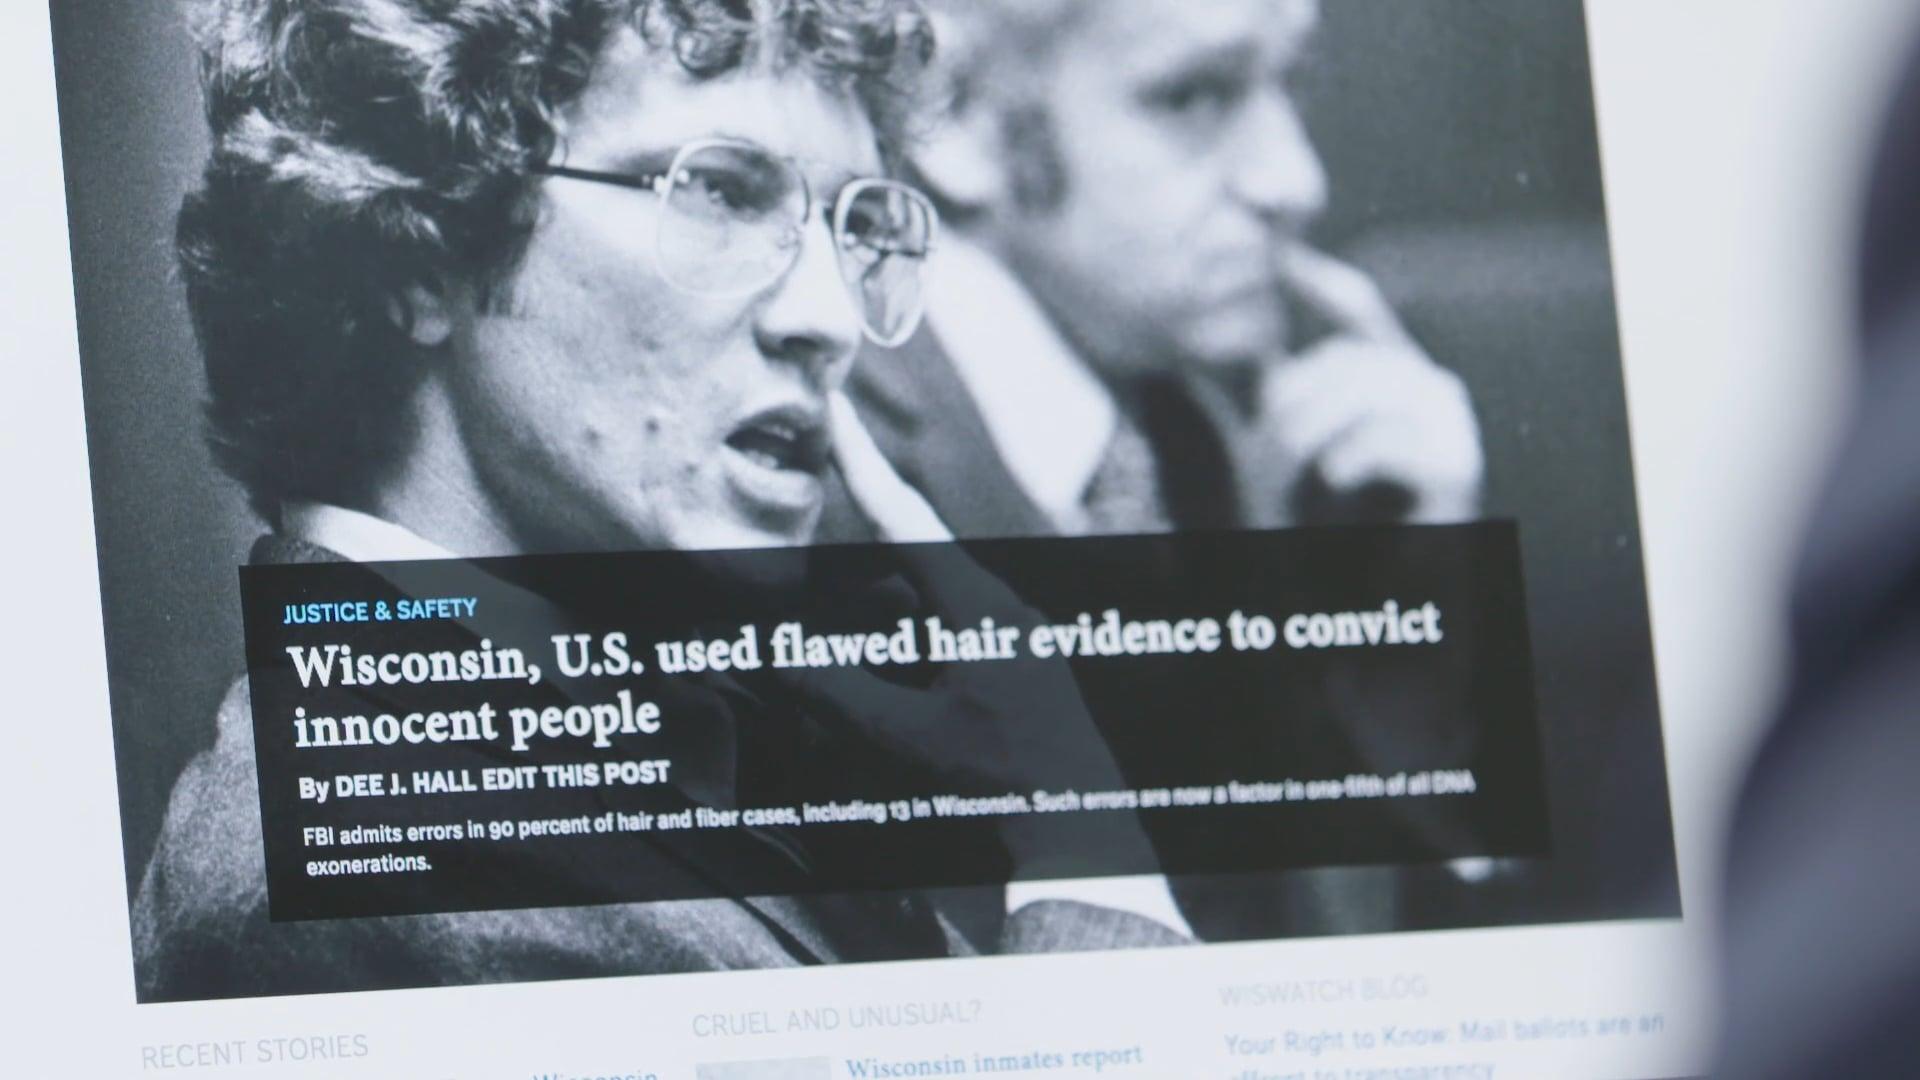 WCIJ (Wisconsin Center for Investigative Journalism)